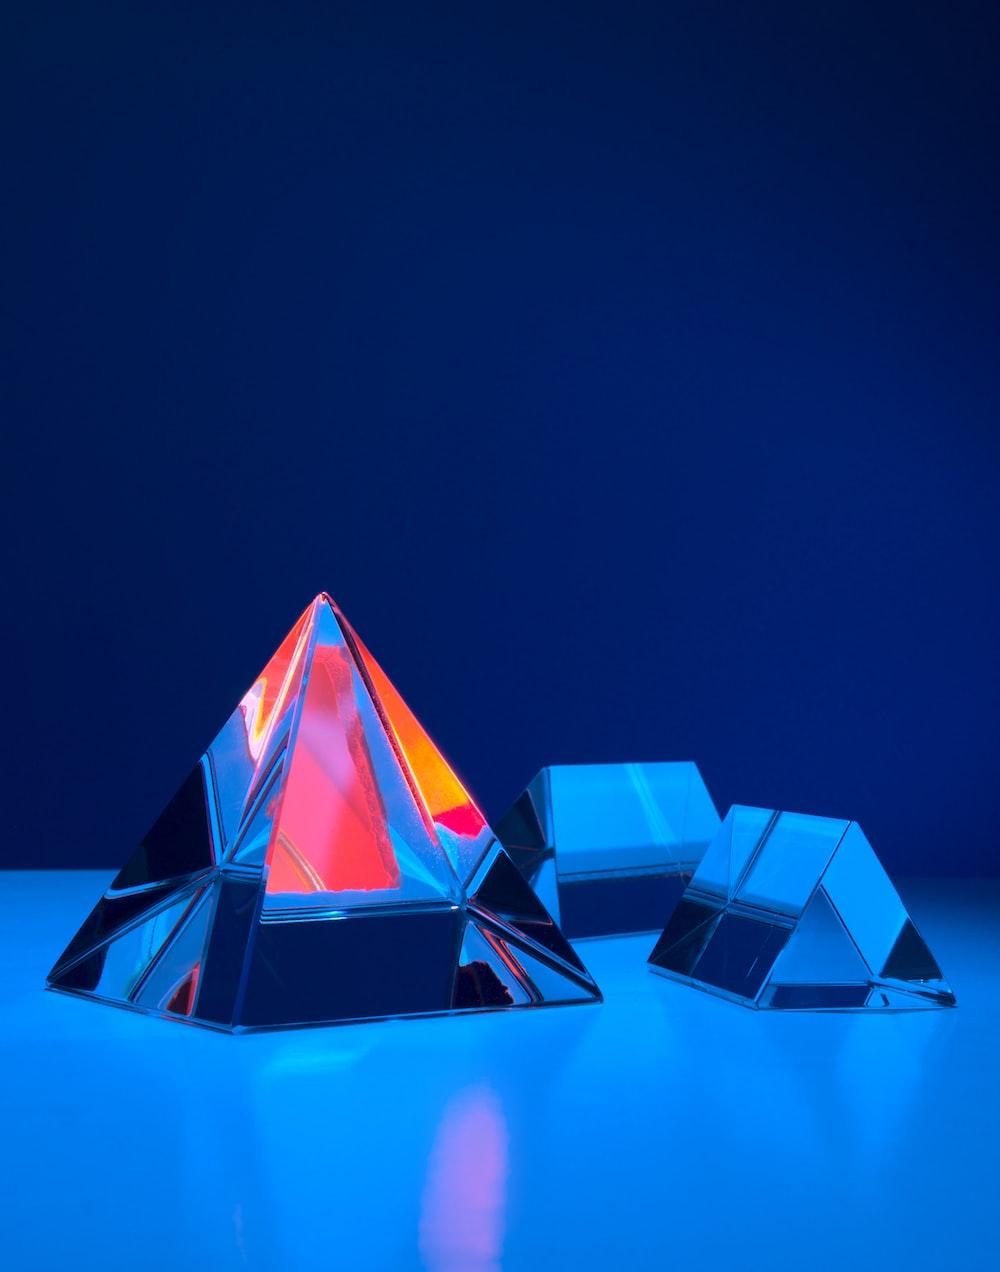 3 blue and red diamond illustration